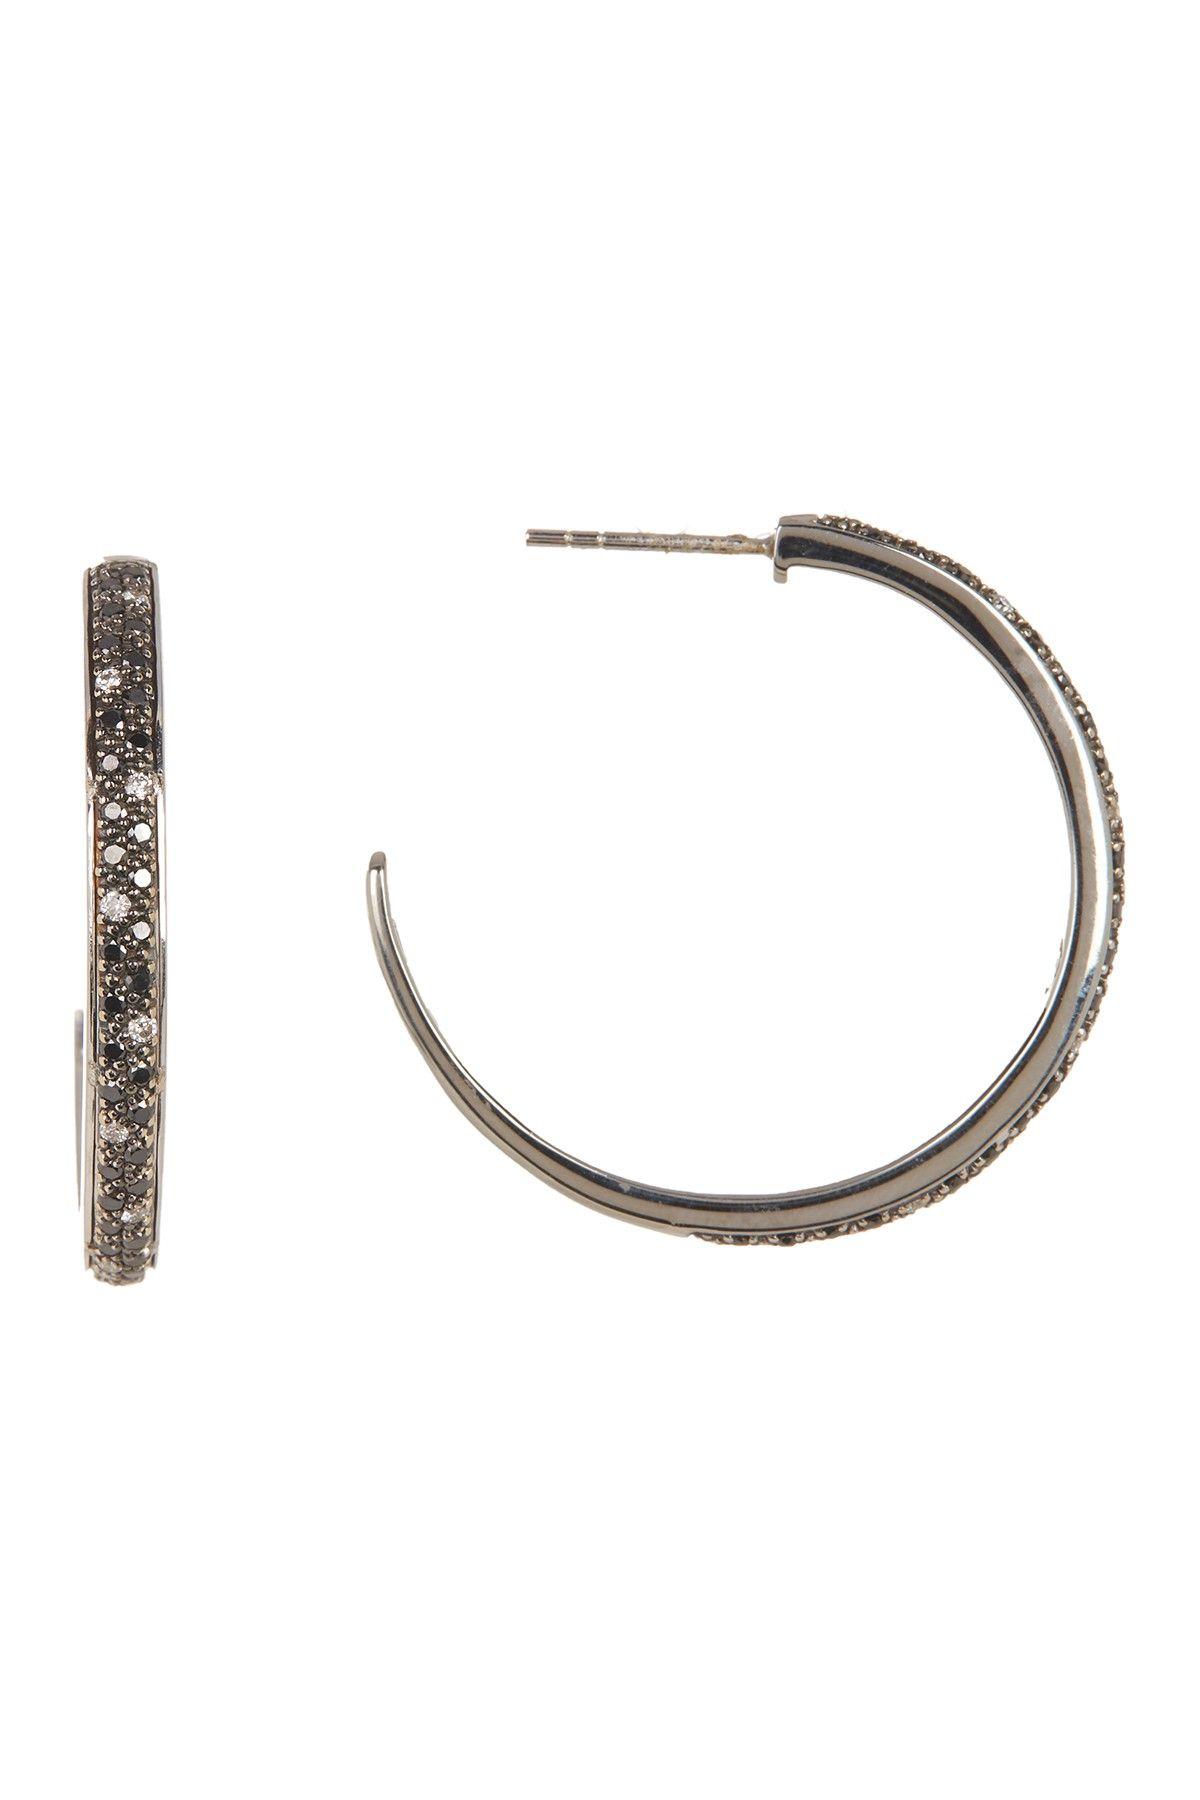 950ad0182 ALOR   18K White Gold Hoop Diamond Accent Earrings - 0.92 ctw ...